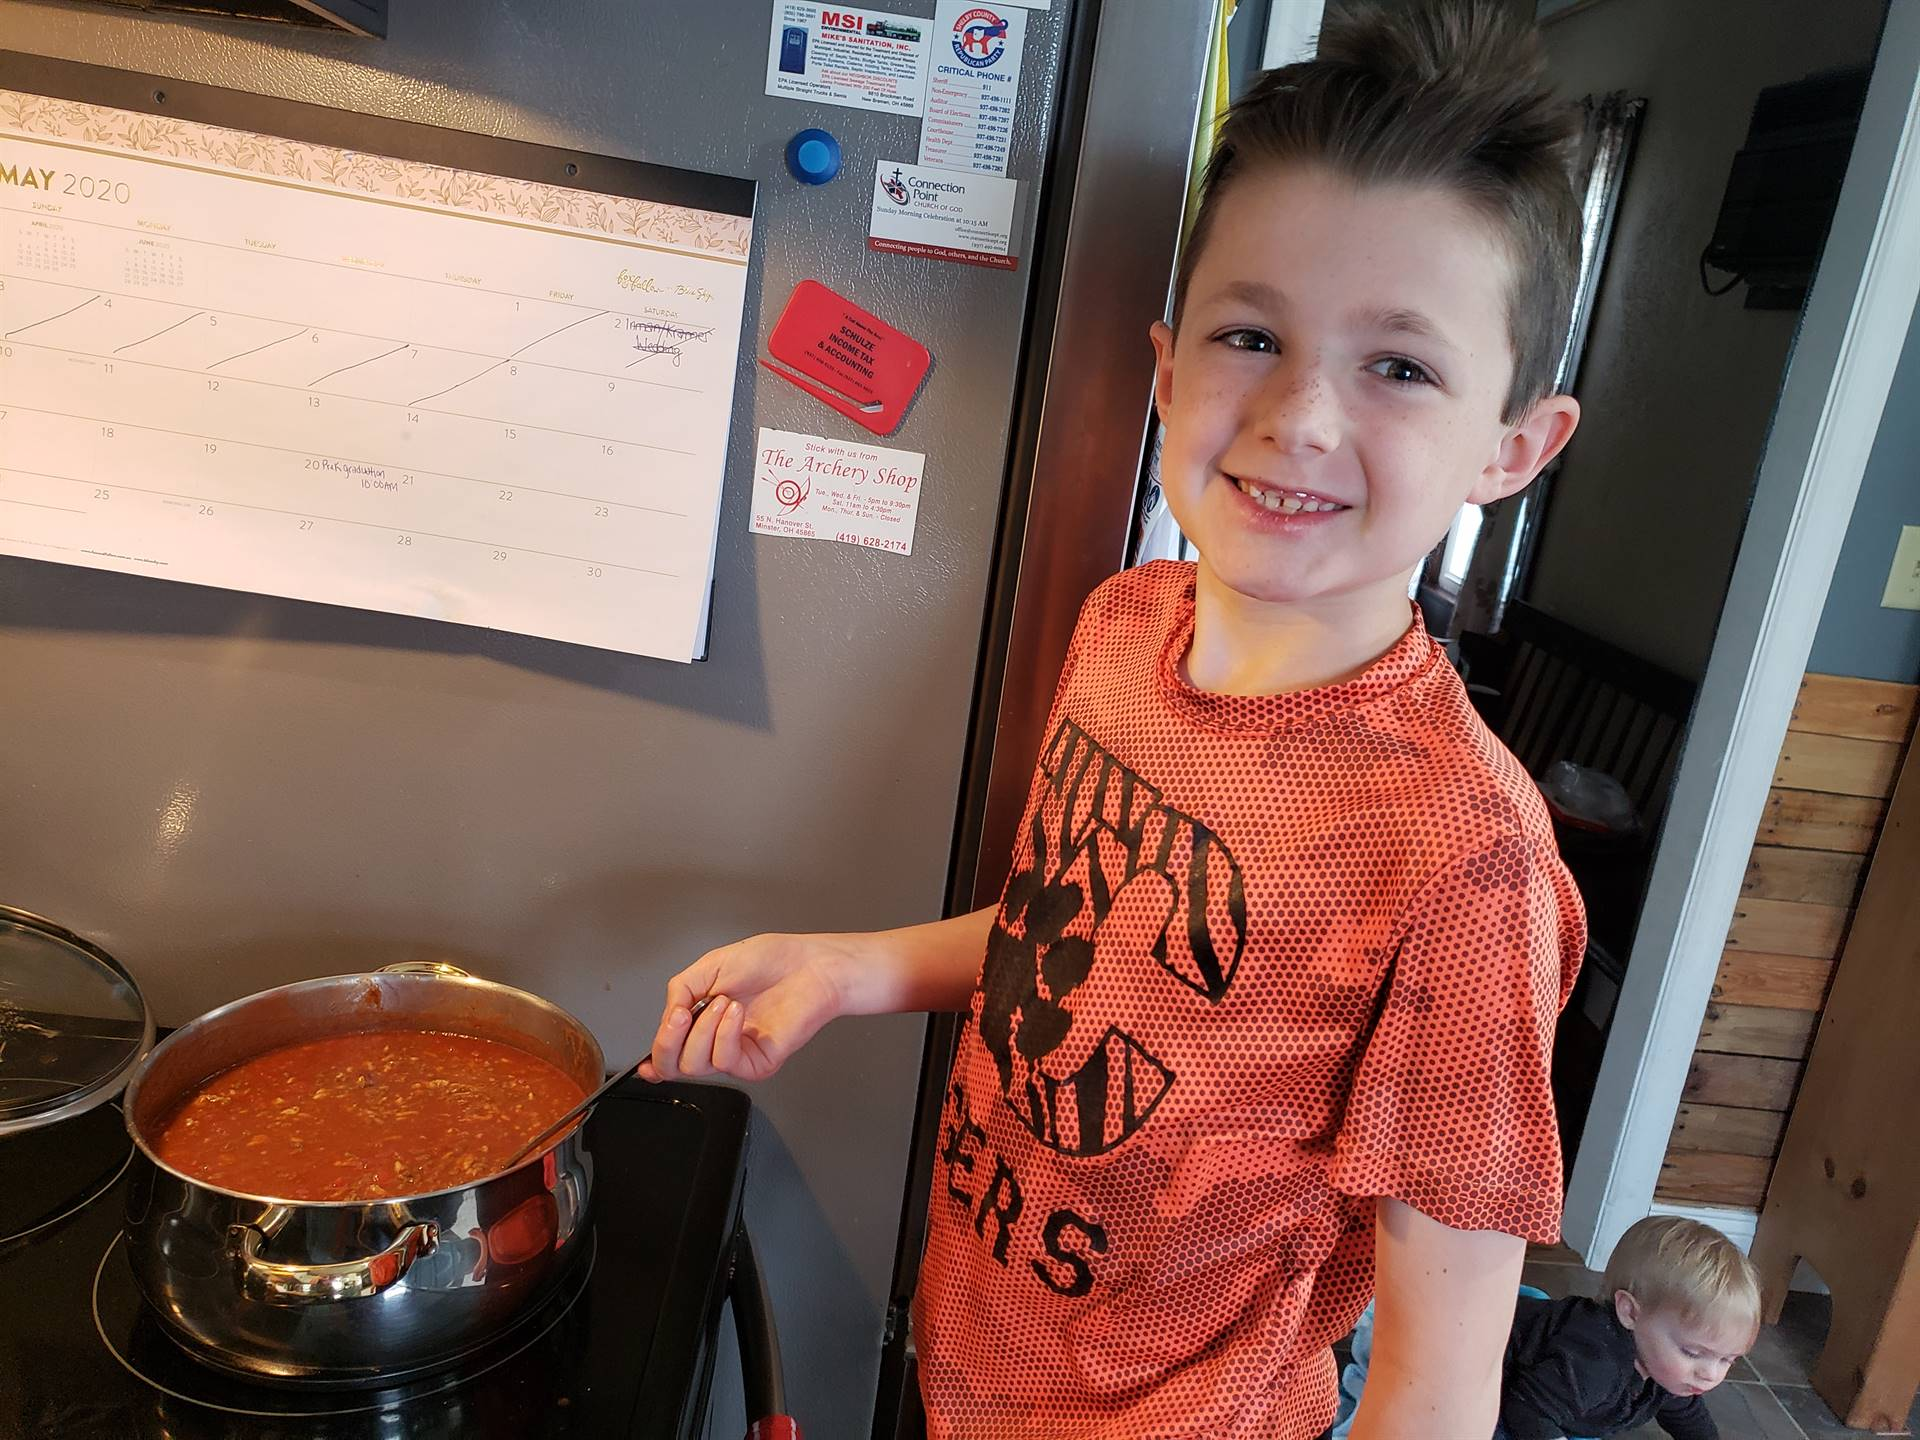 boy with chili